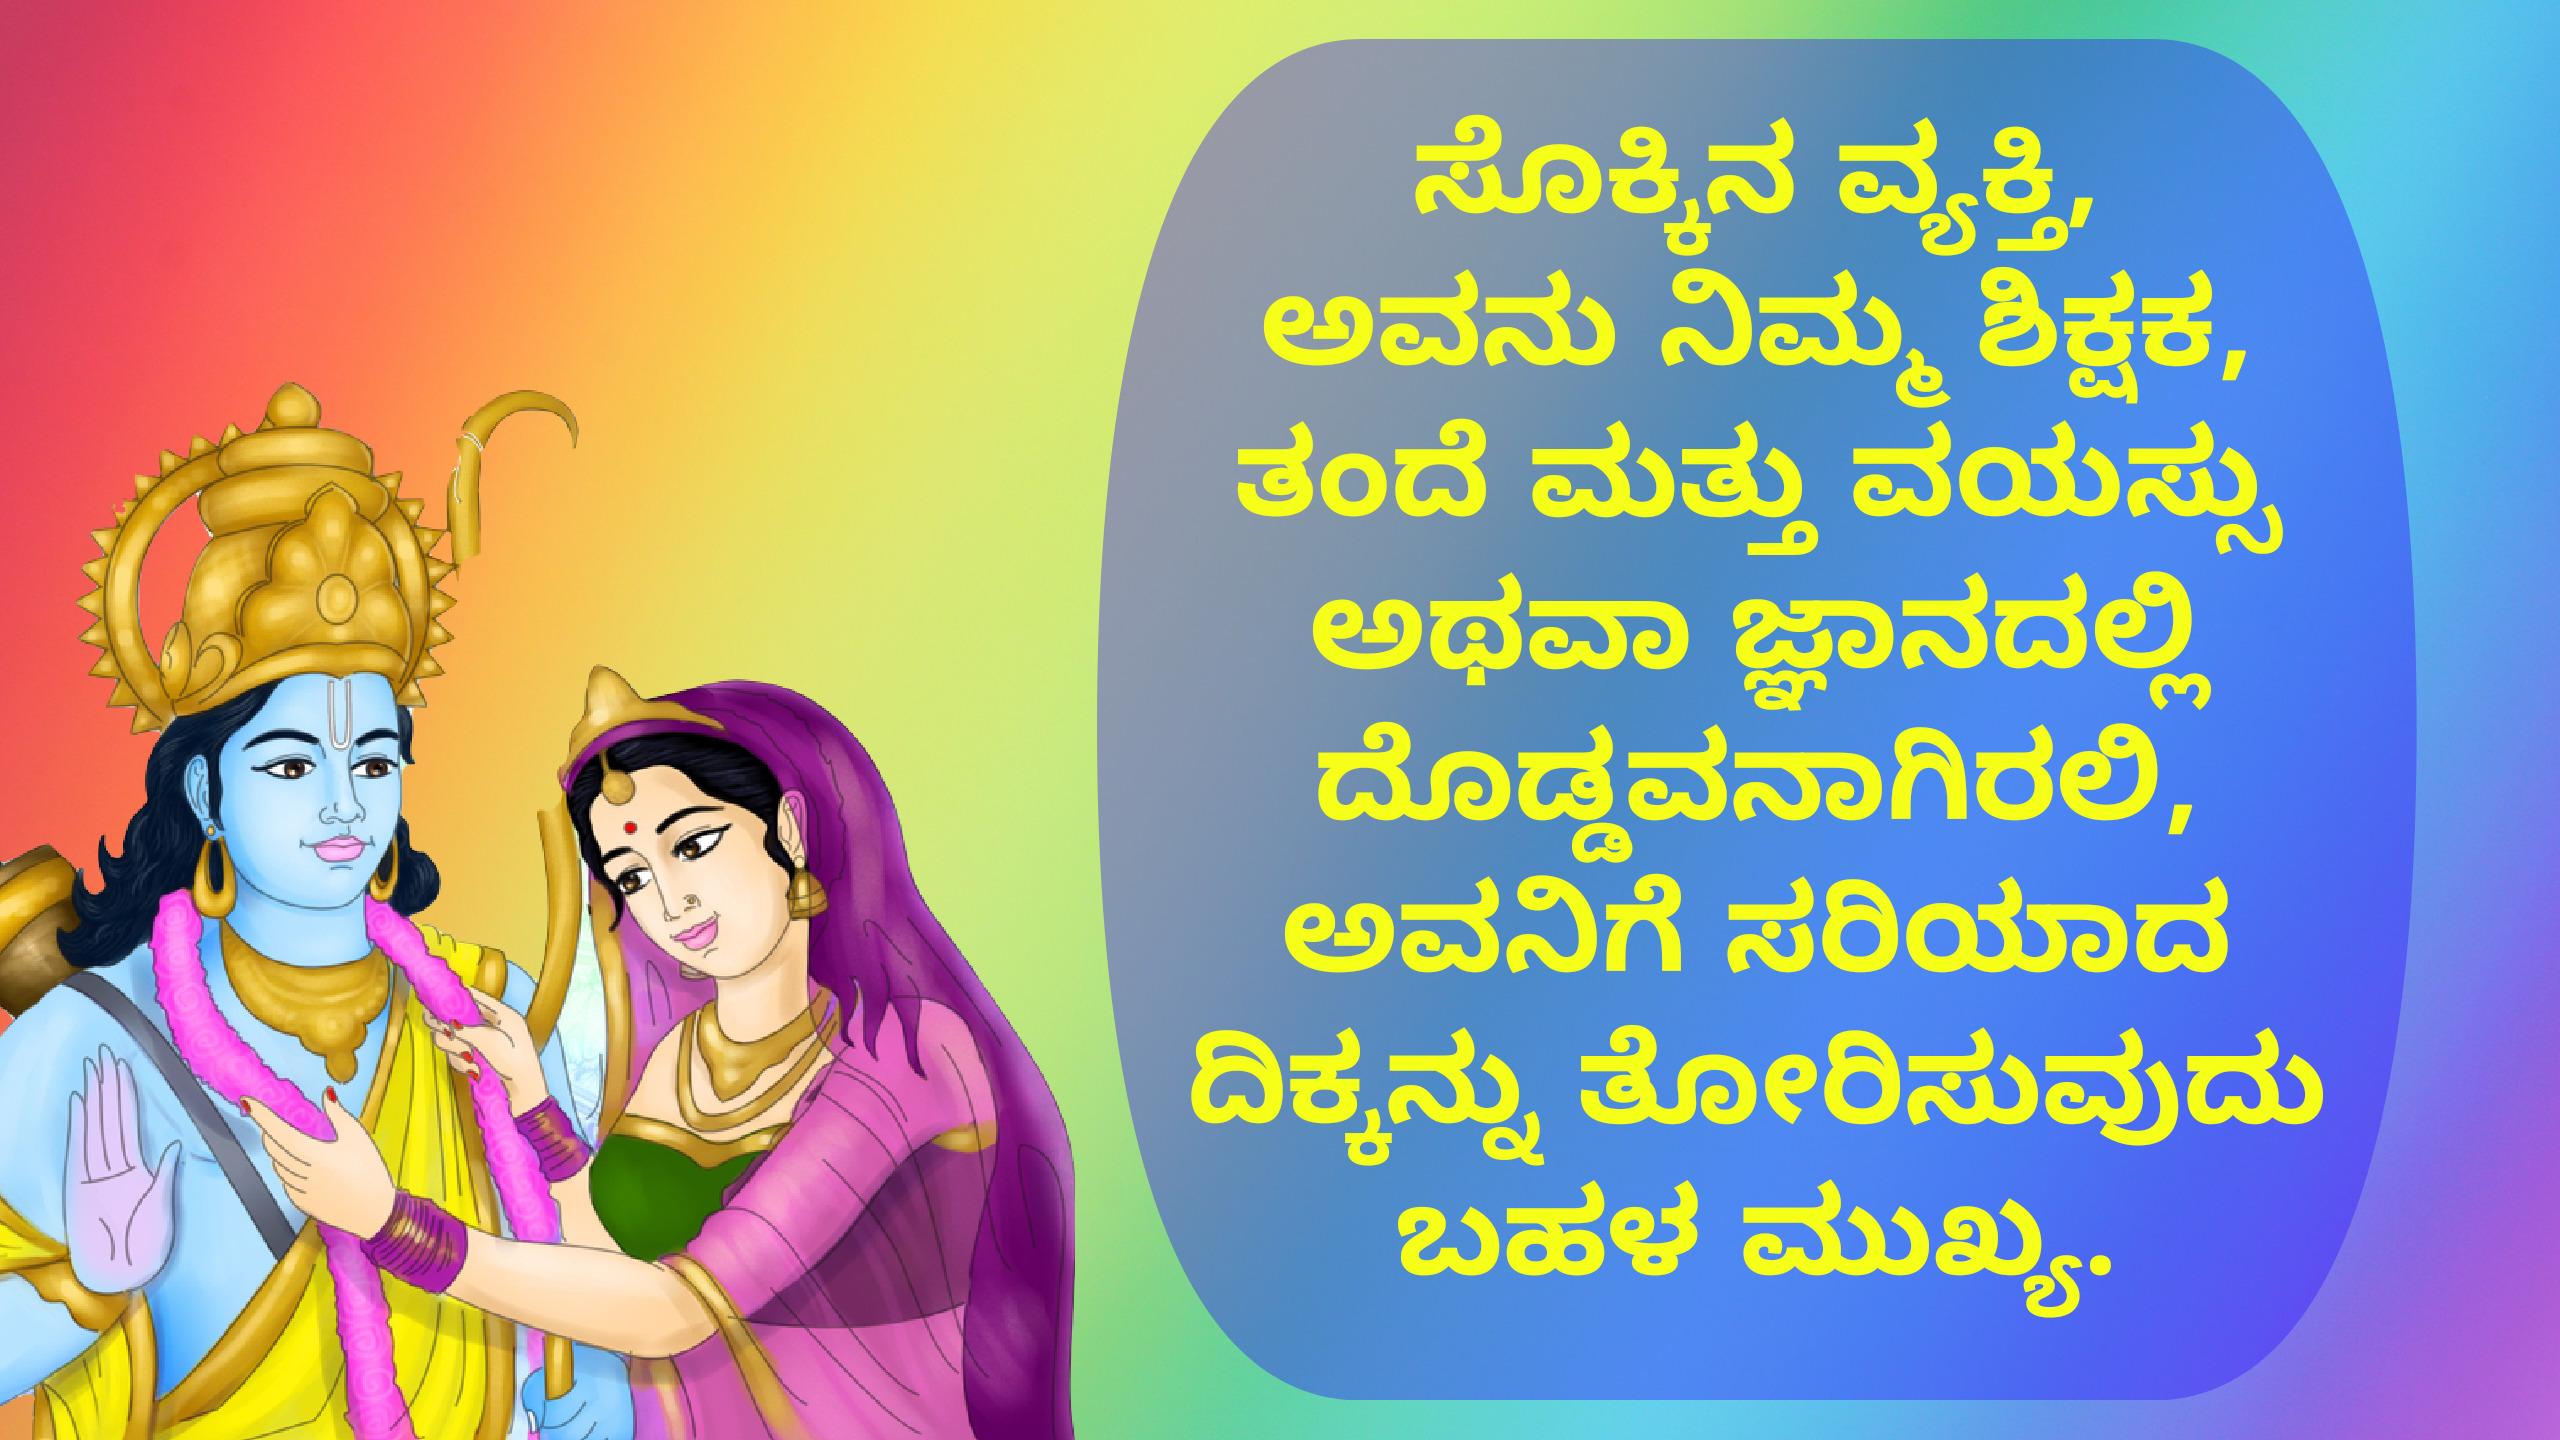 4. Shree Ram Quotes in Kannada